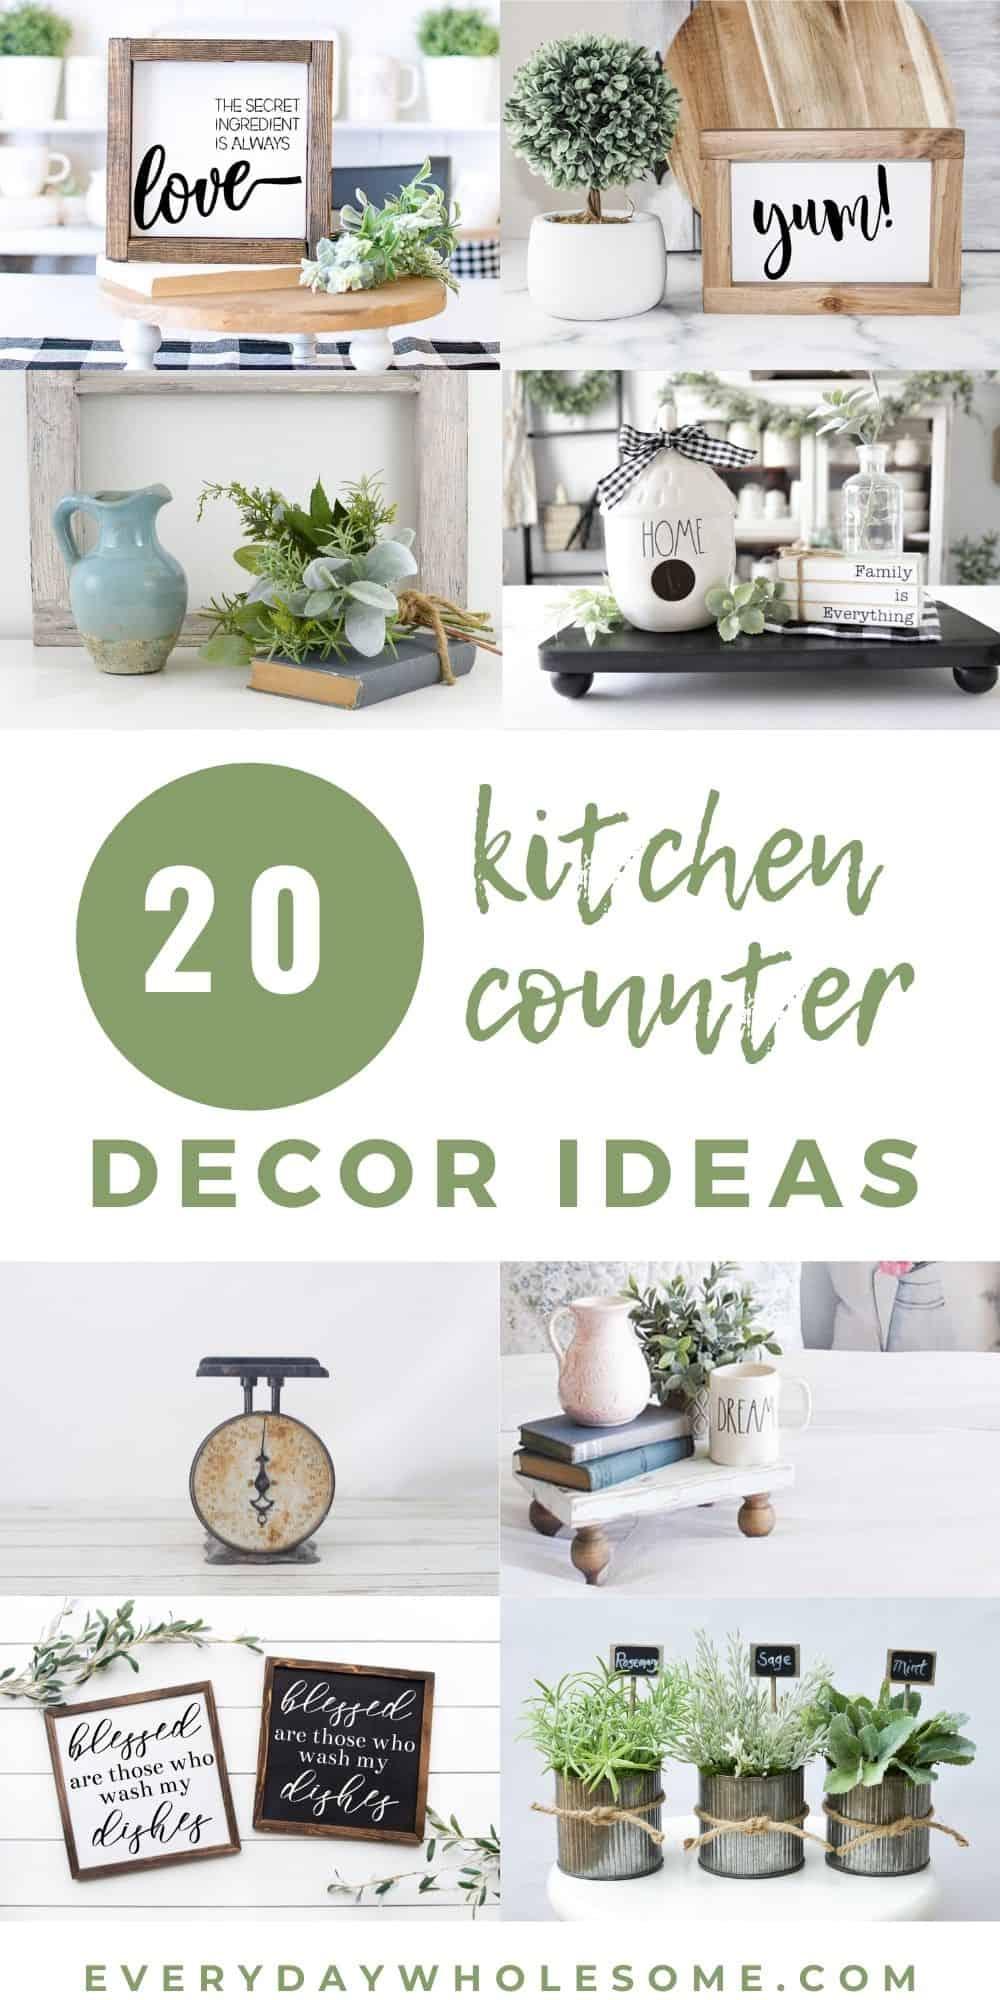 Everyday Wholesome 20 Kitchen Countertop Decor Ideas